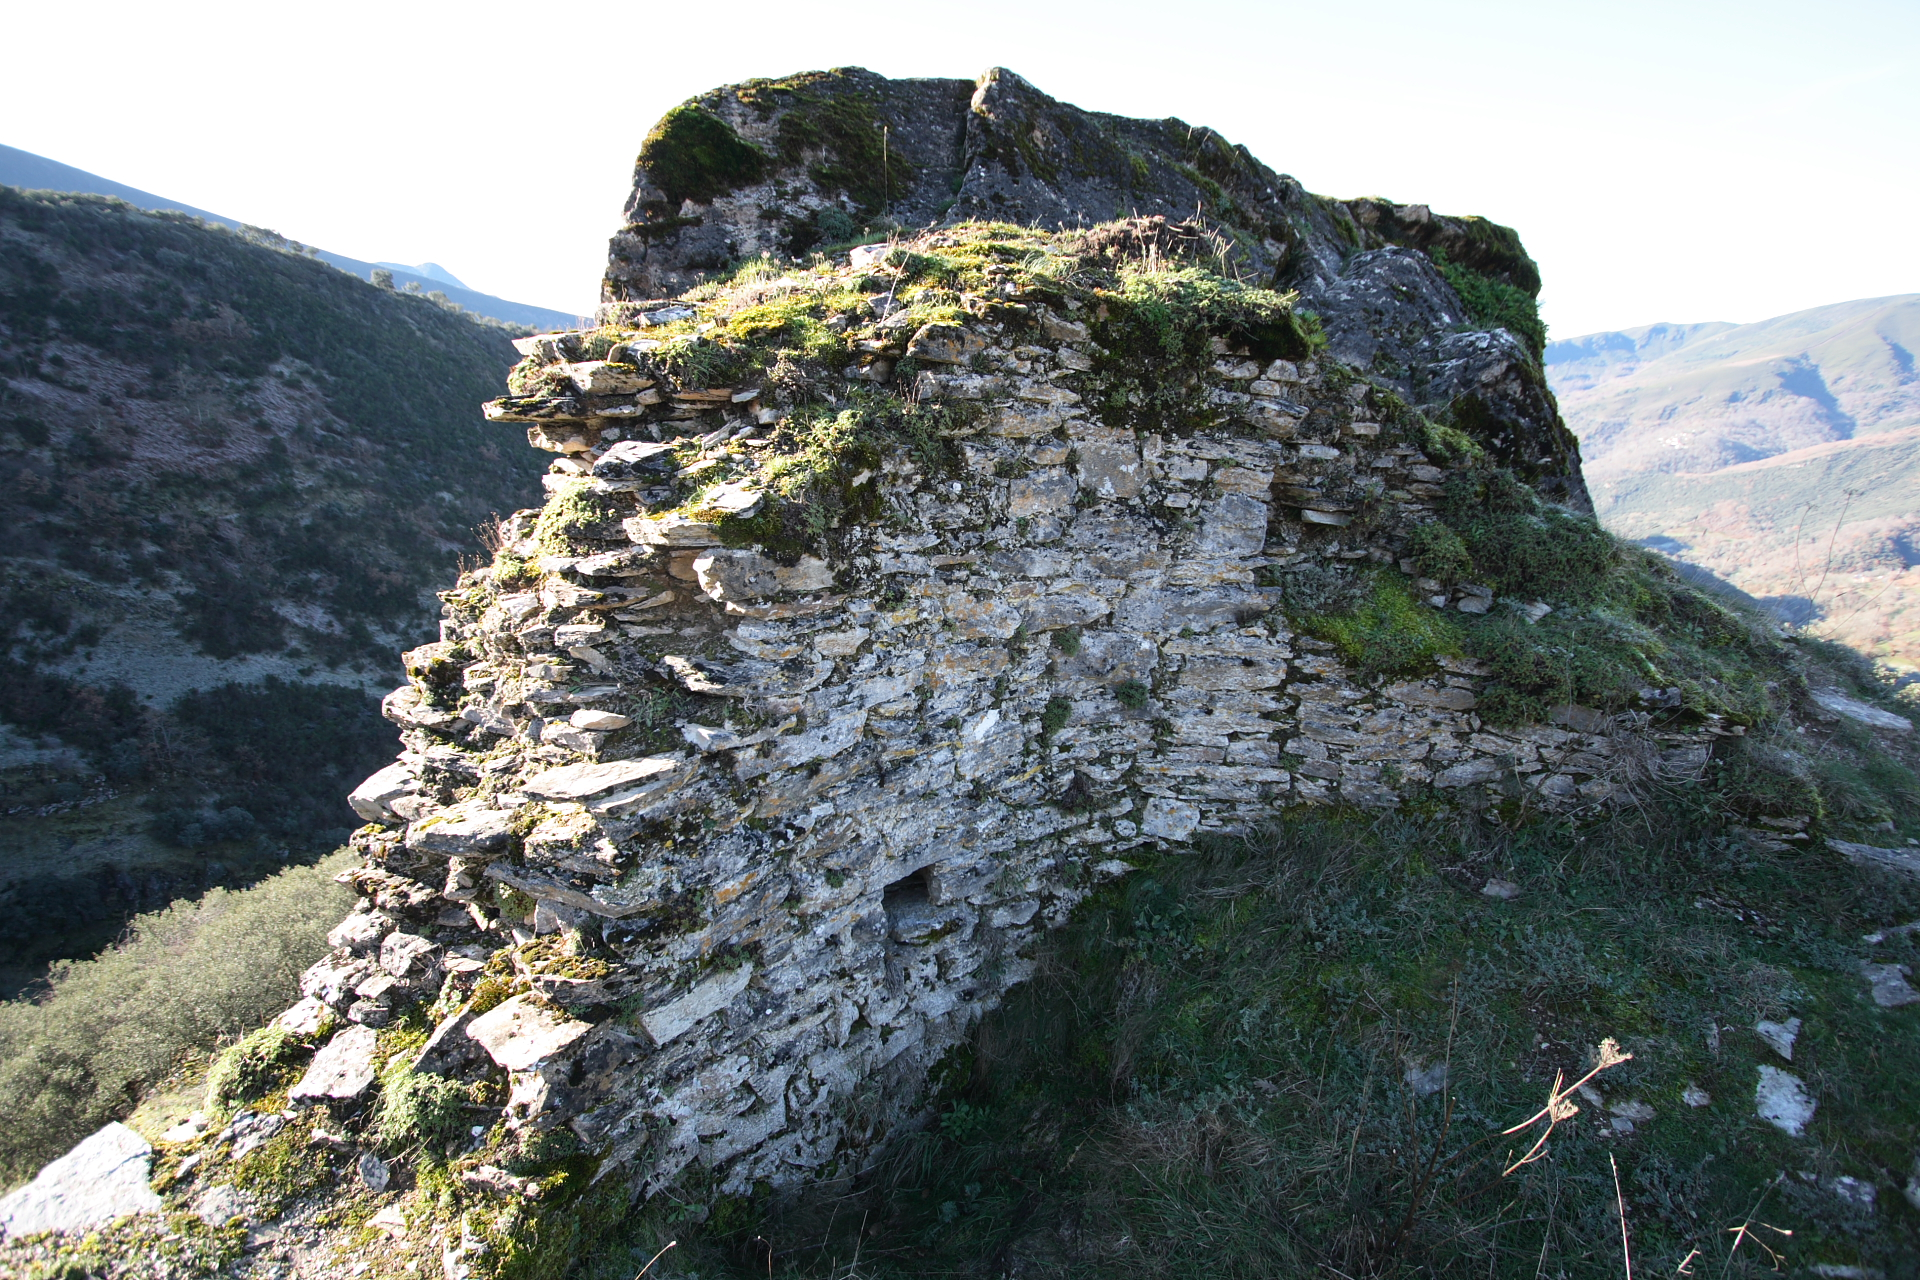 Muro do castelo